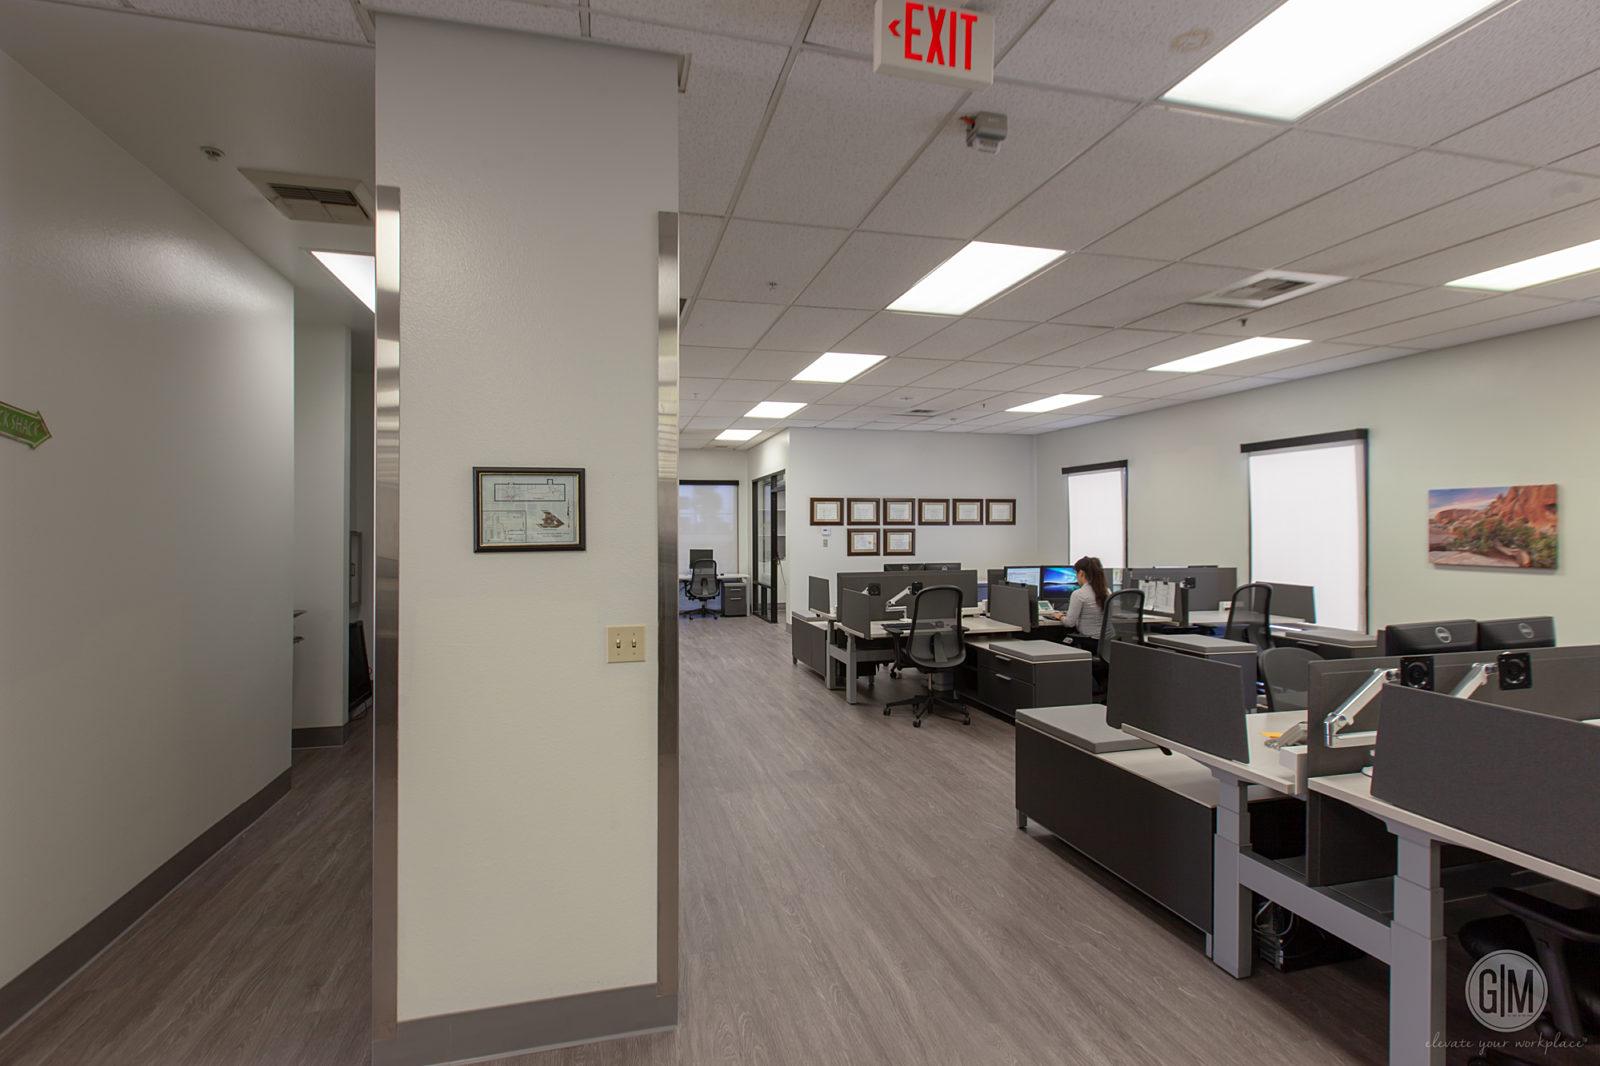 COSB Coroner's Office Hallway Makeover